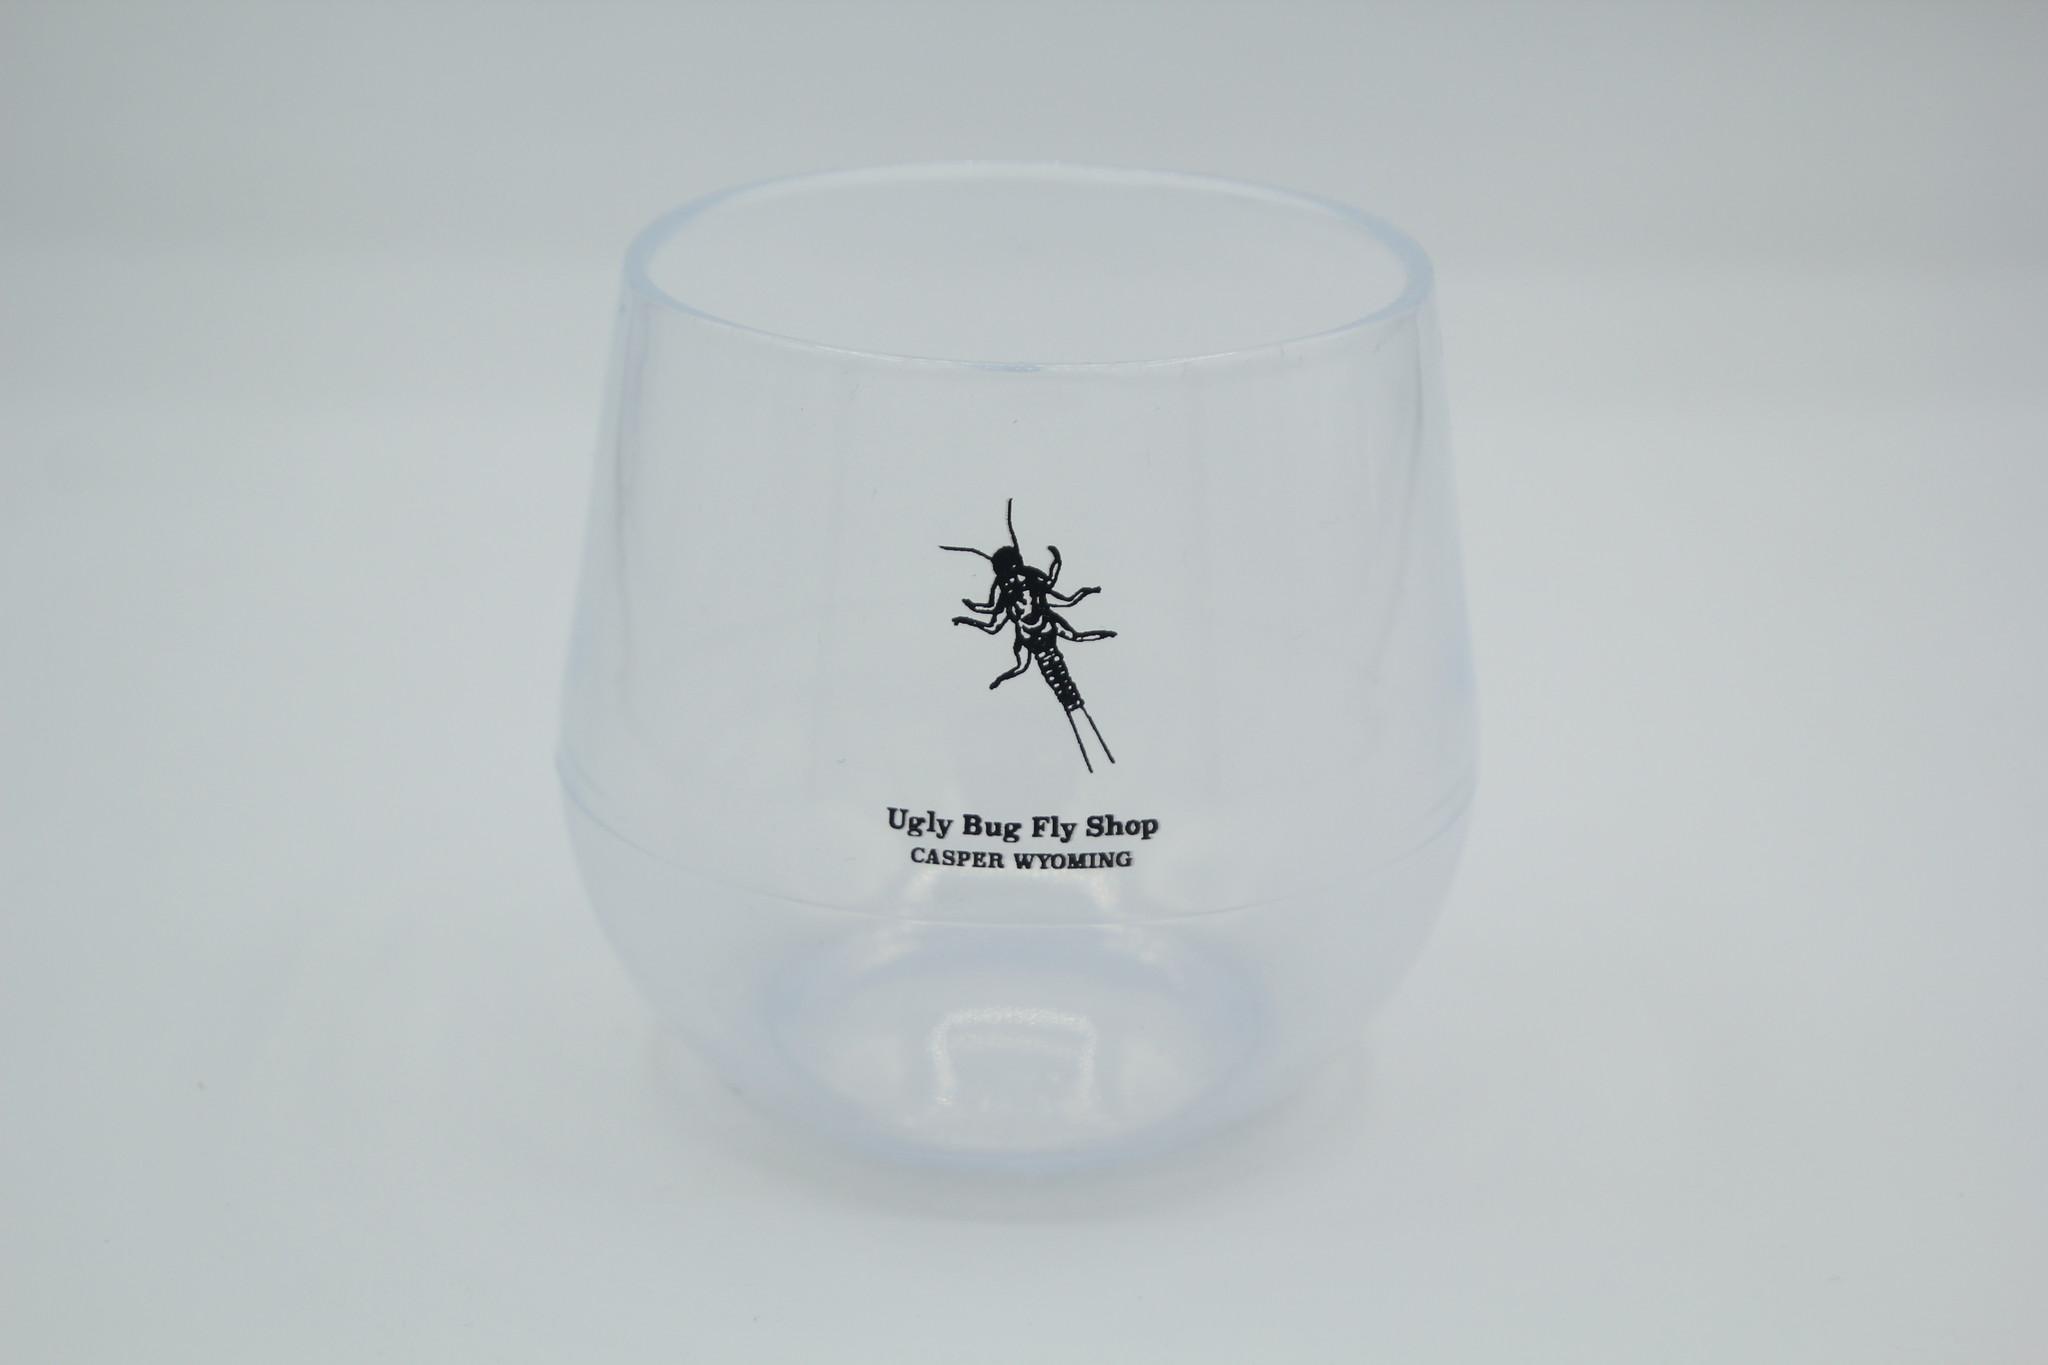 Sili Pint Sili Pint 14 oz Wine Glass